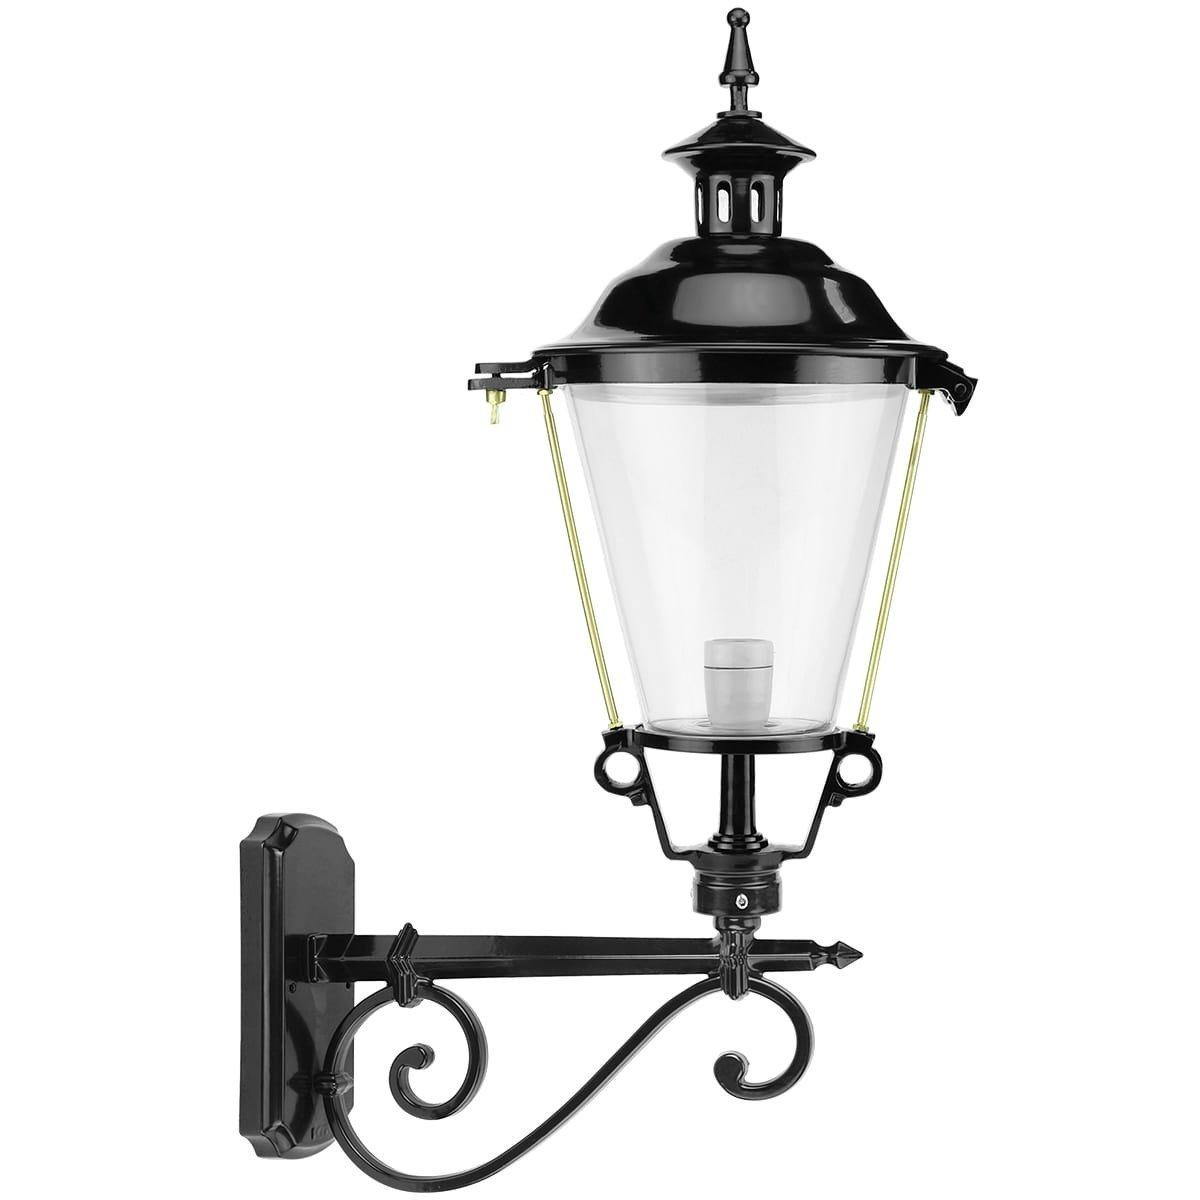 Outdoor Lighting Classic Rural Wall lamp semi classic Aduarderzijl - 80 cm